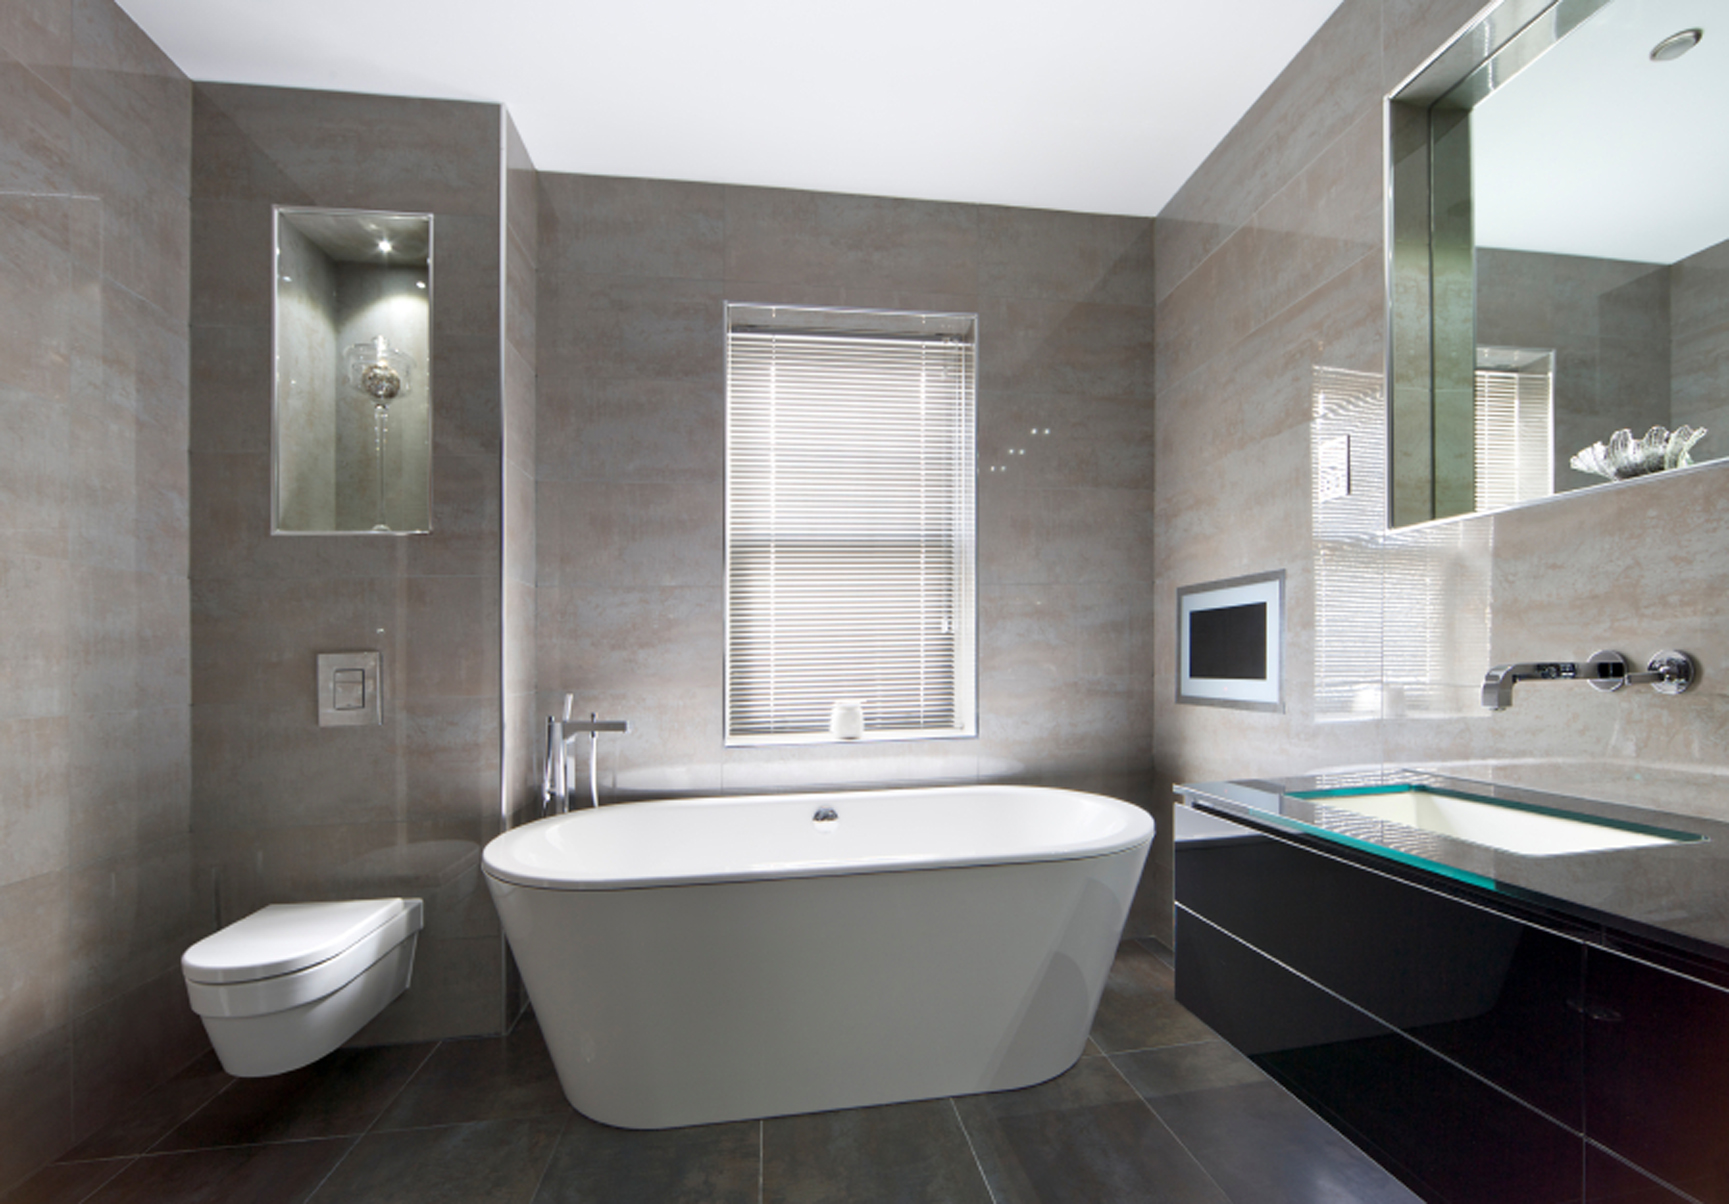 Bathroom Renovations Calgary Bathroom Renovations  Bathroom Remodelling & Design .